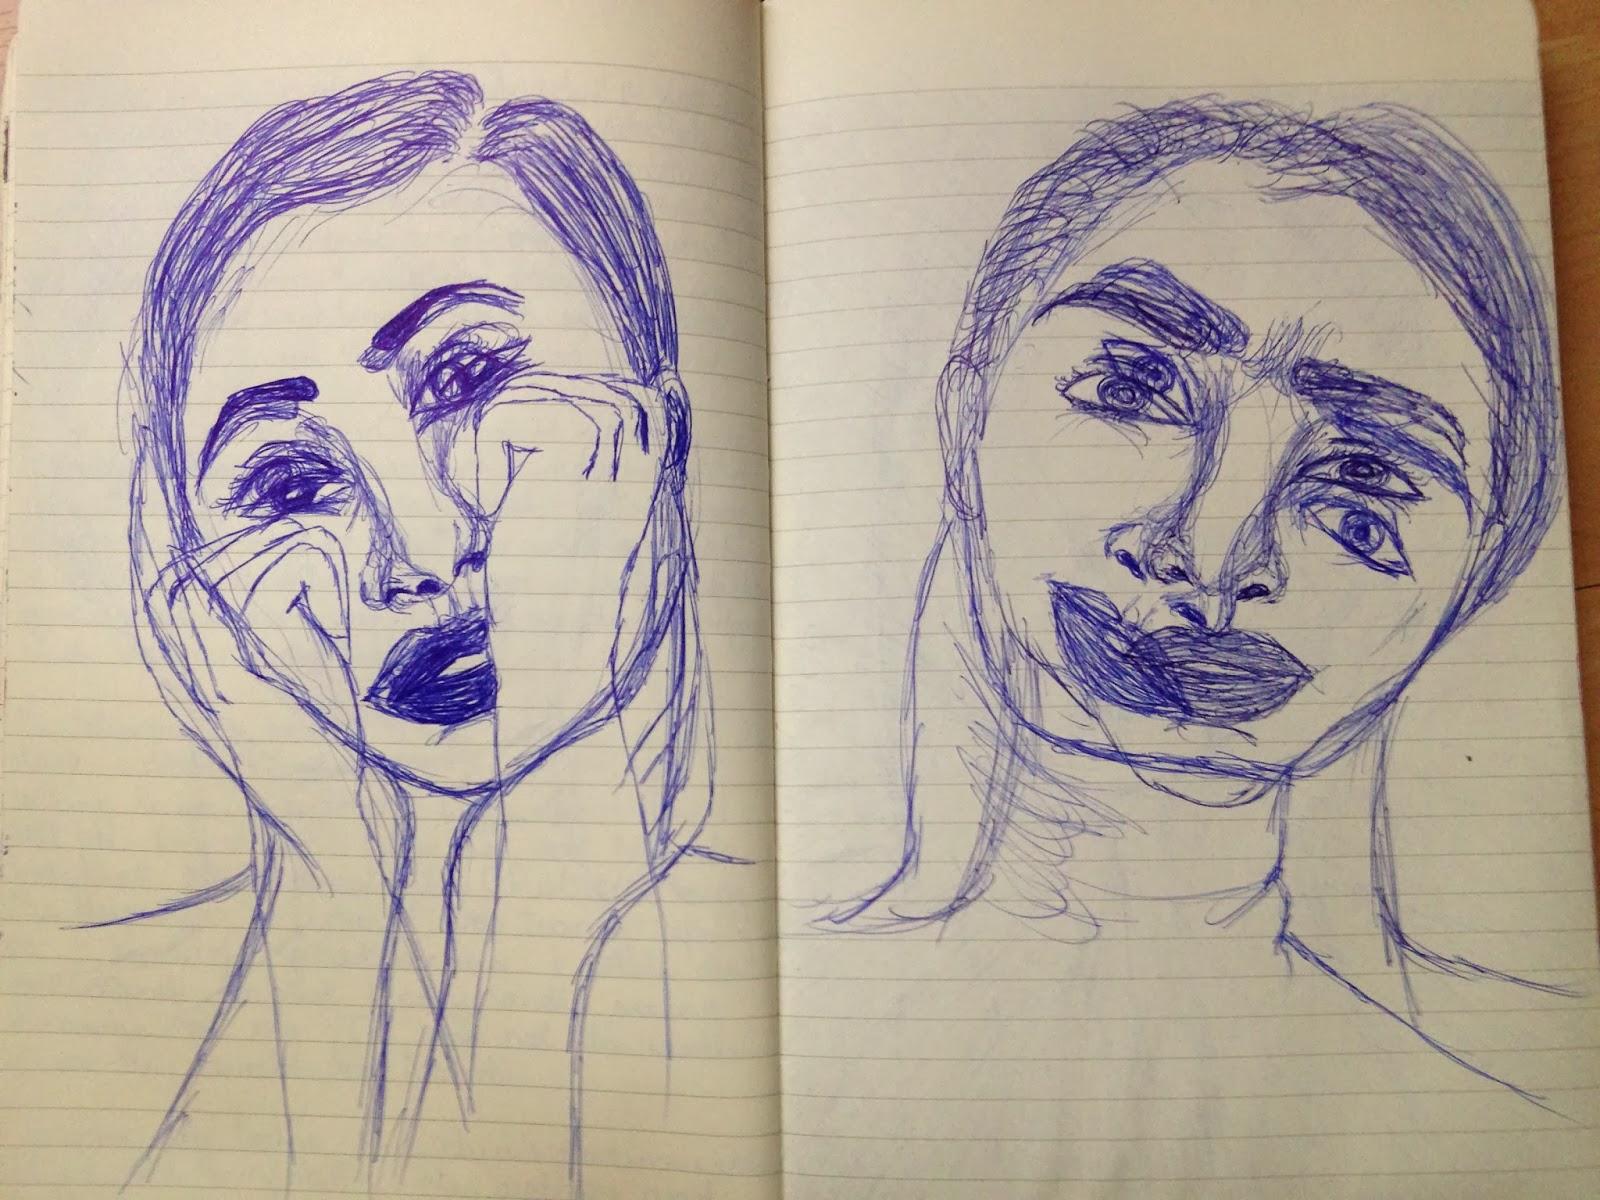 moleskin journal illustrations